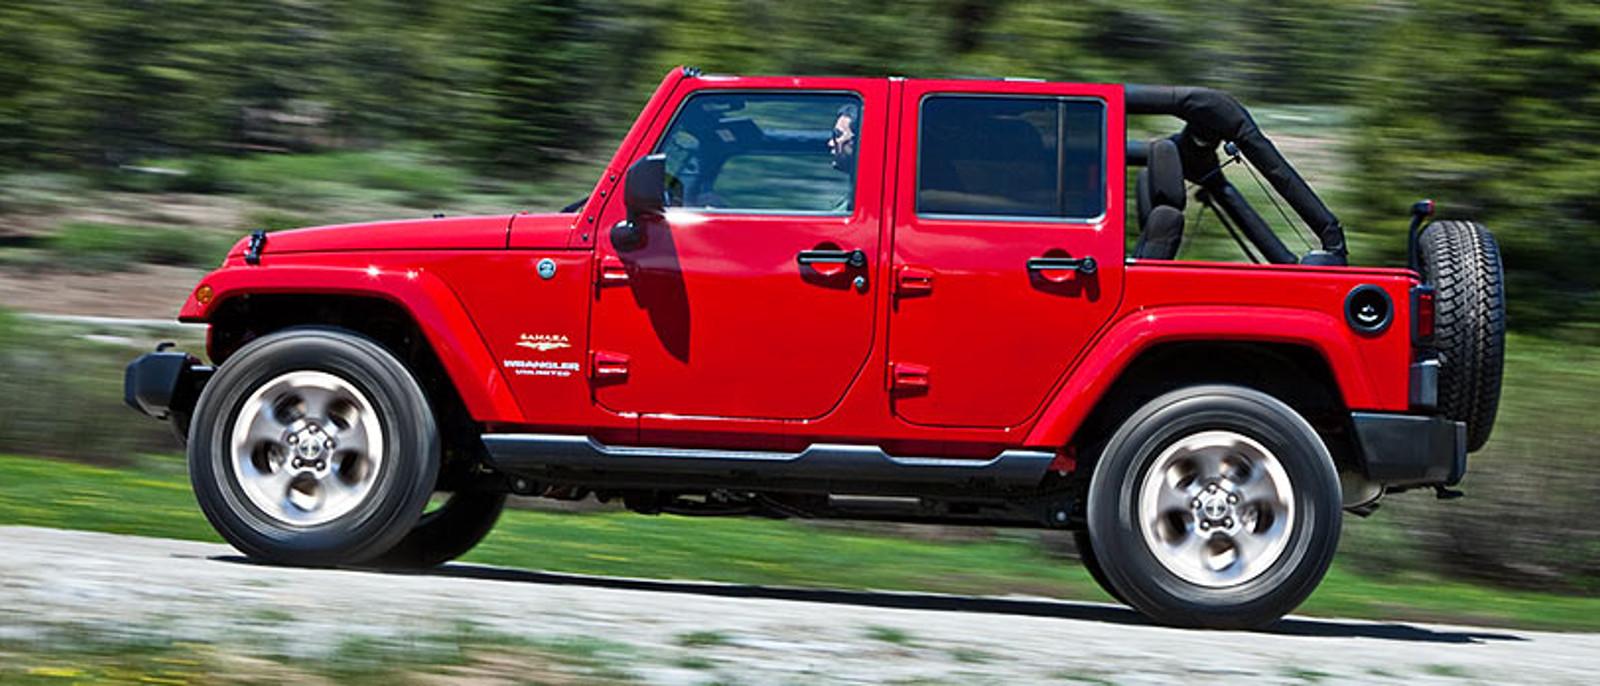 2015 Jeep wrangler side